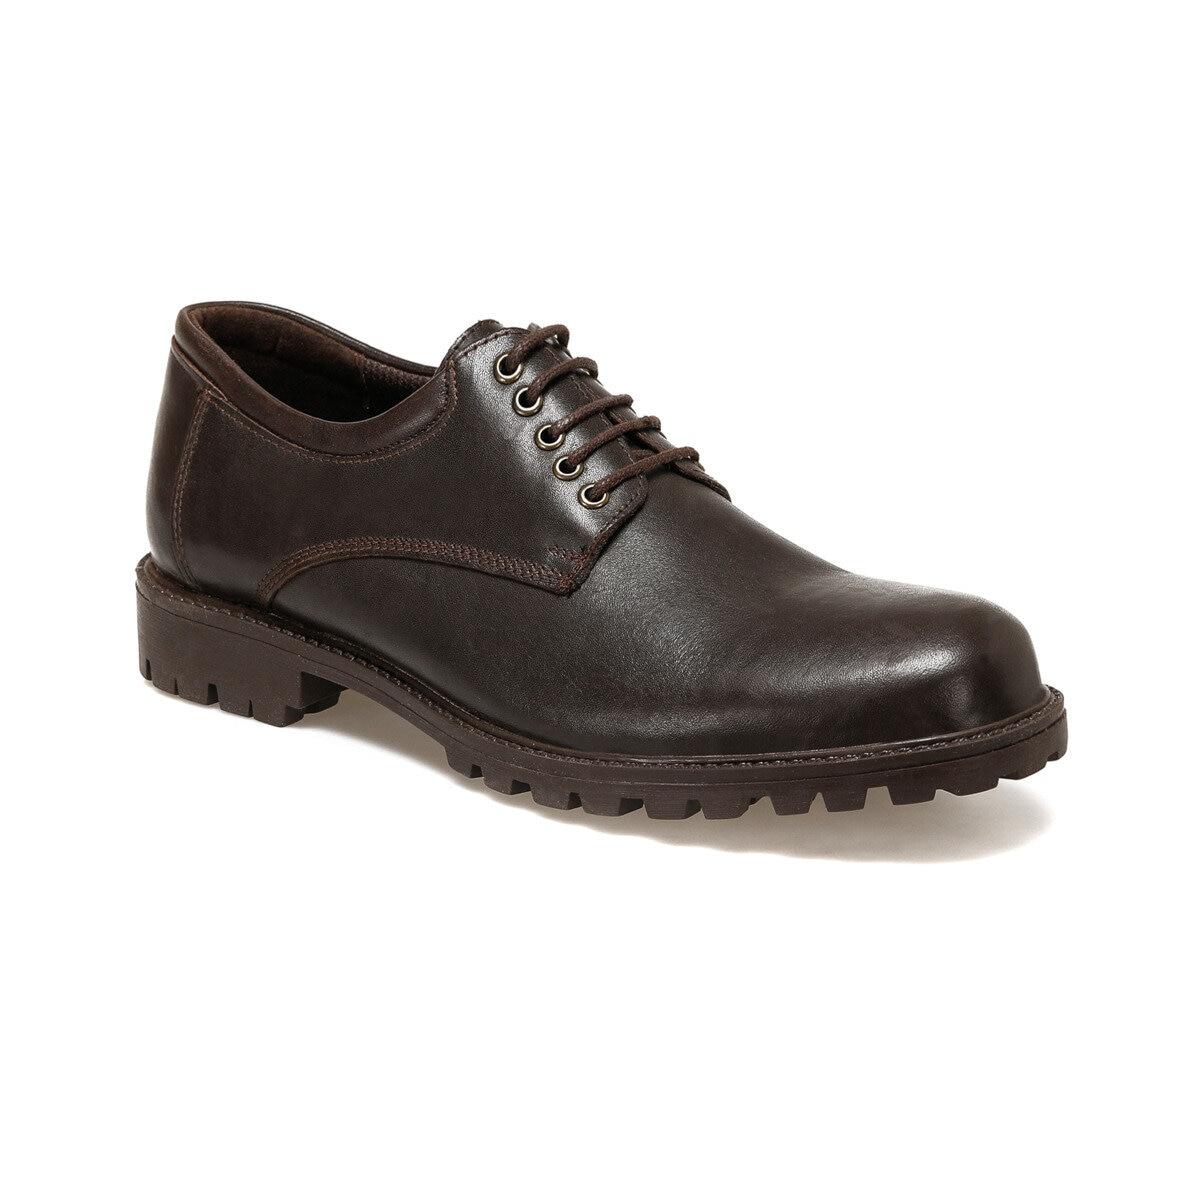 FLO 102 Brown Men 'S Classic Shoes Garamond